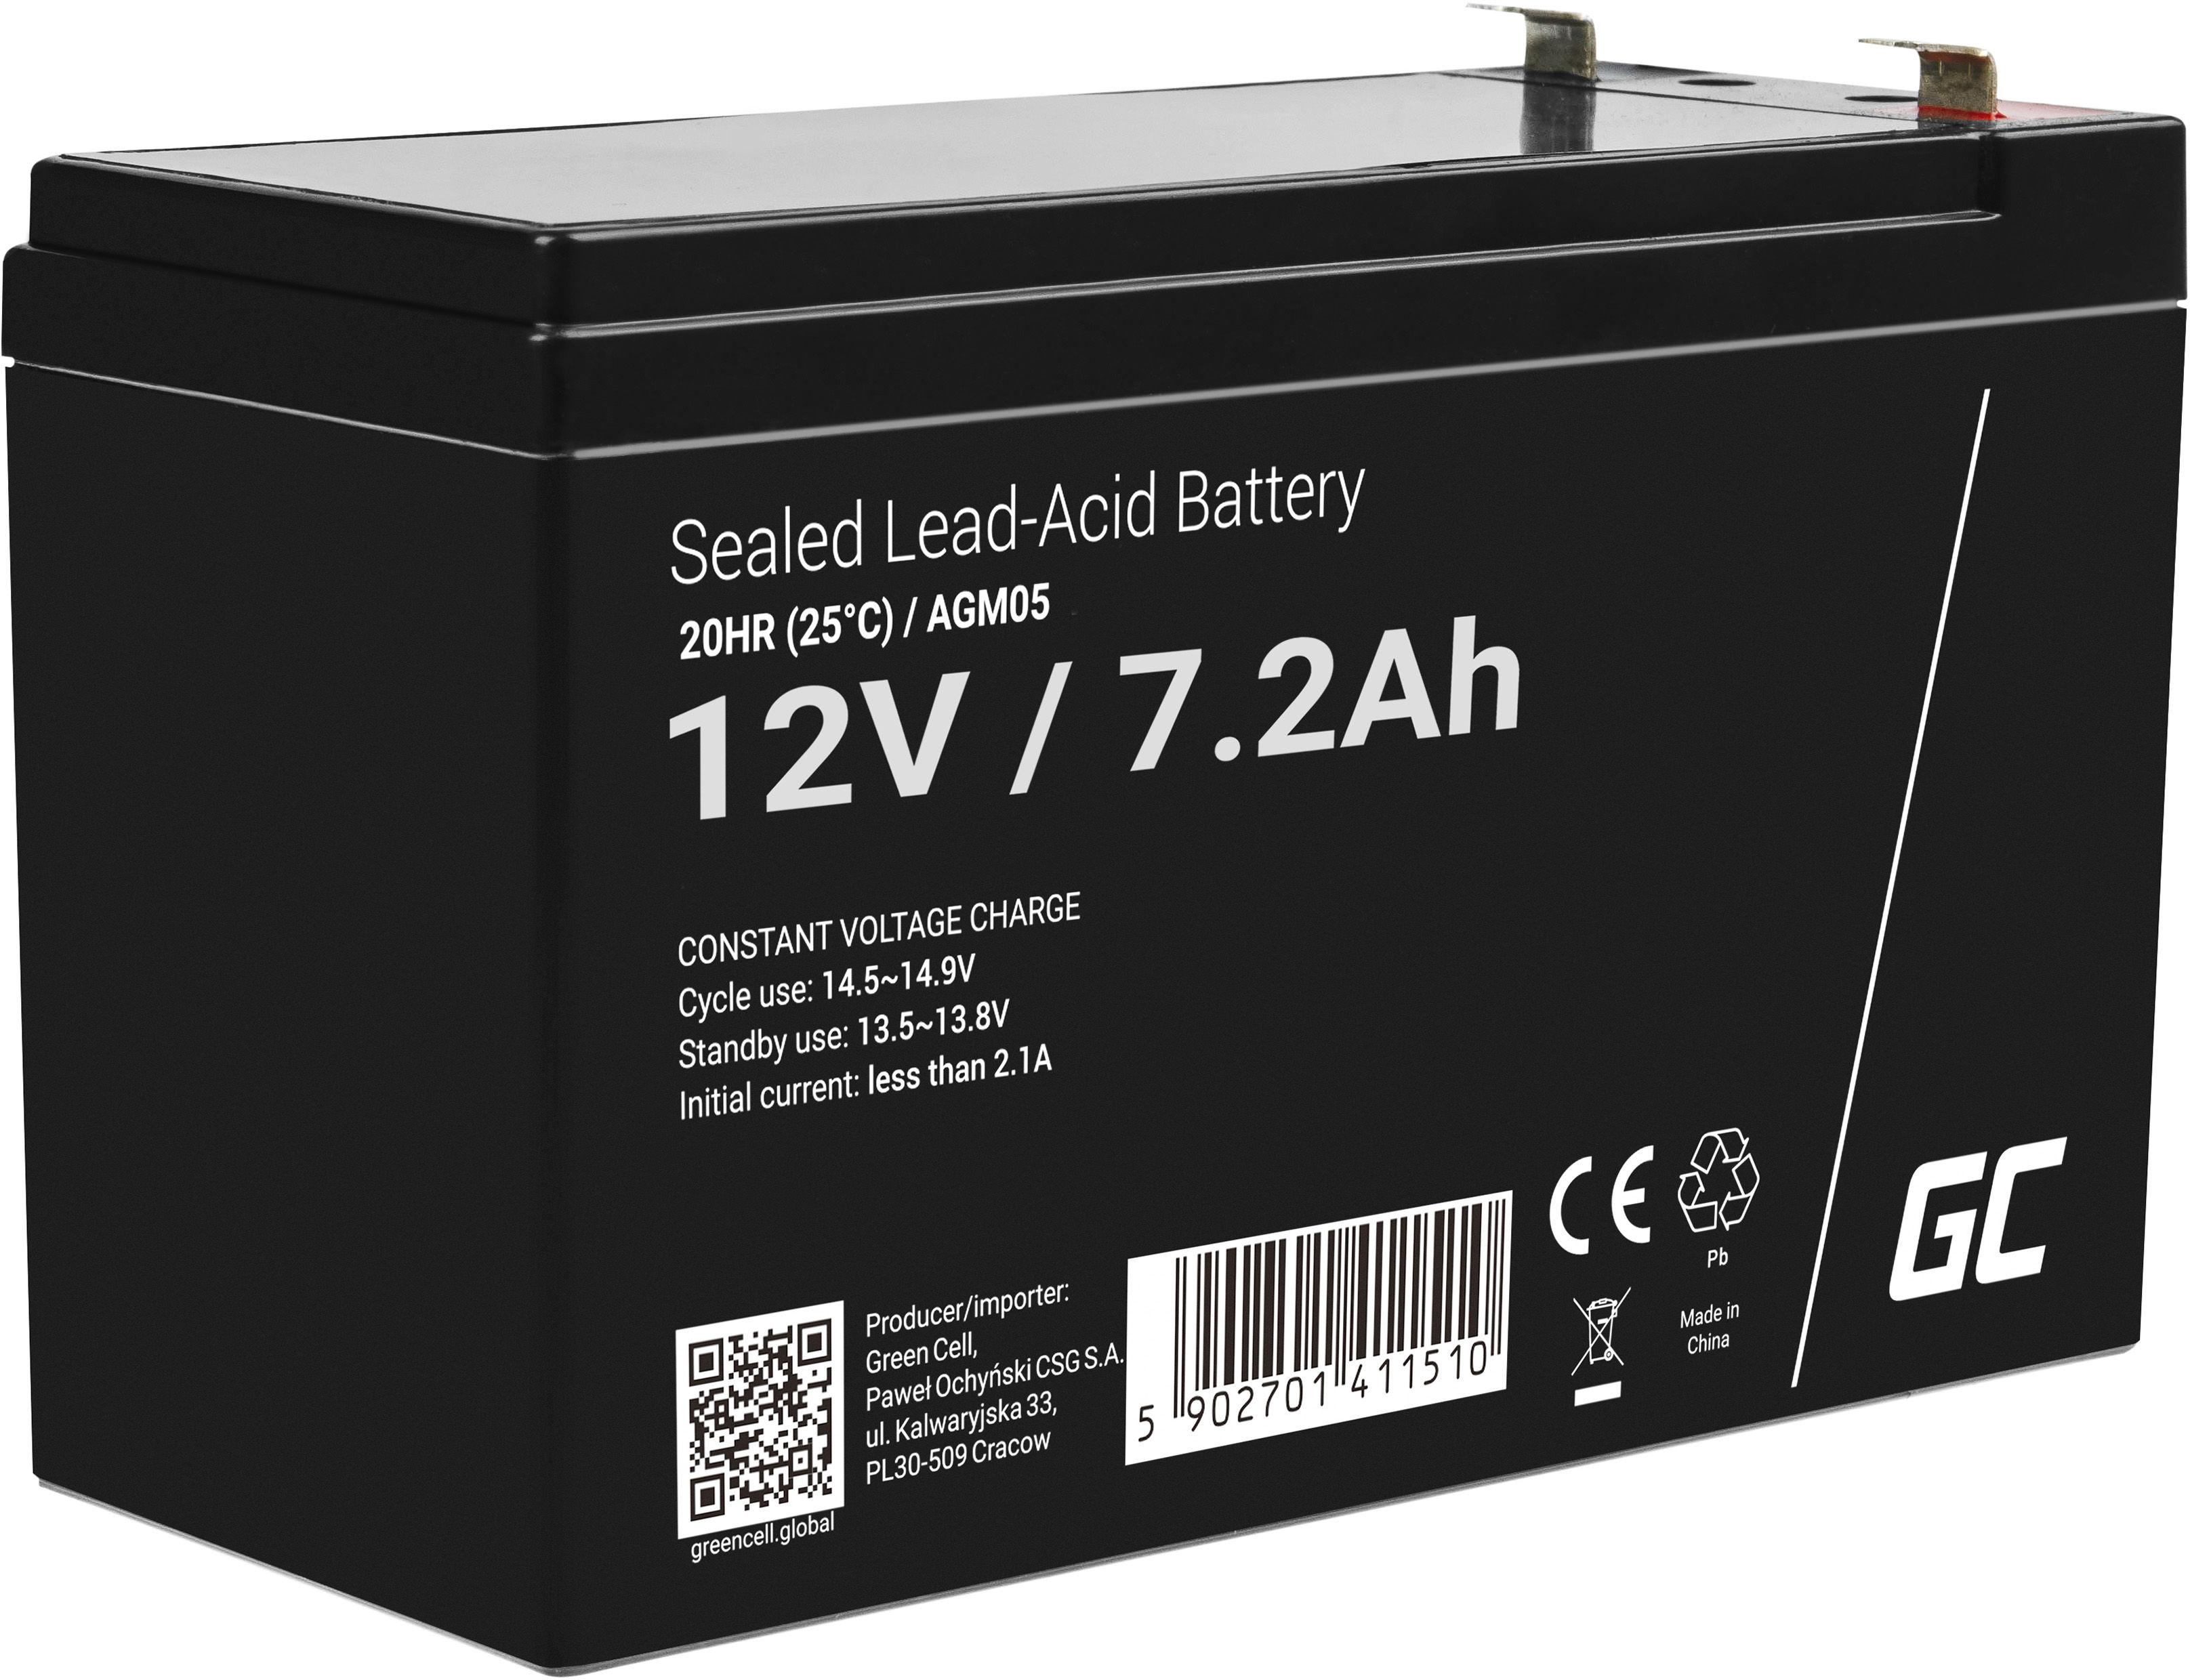 Akumulator bezobsługowy AGM VRLA Green Cell 12V 7.2Ah do systemów alarmowych i zabawek